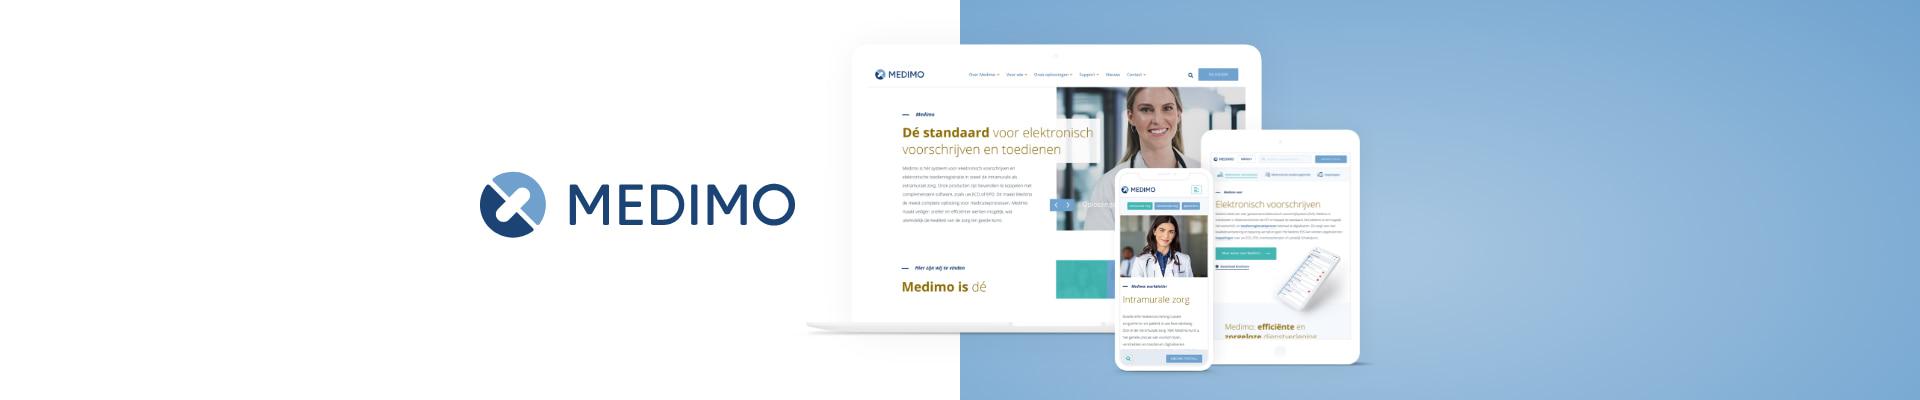 Medimo: UX-design en content